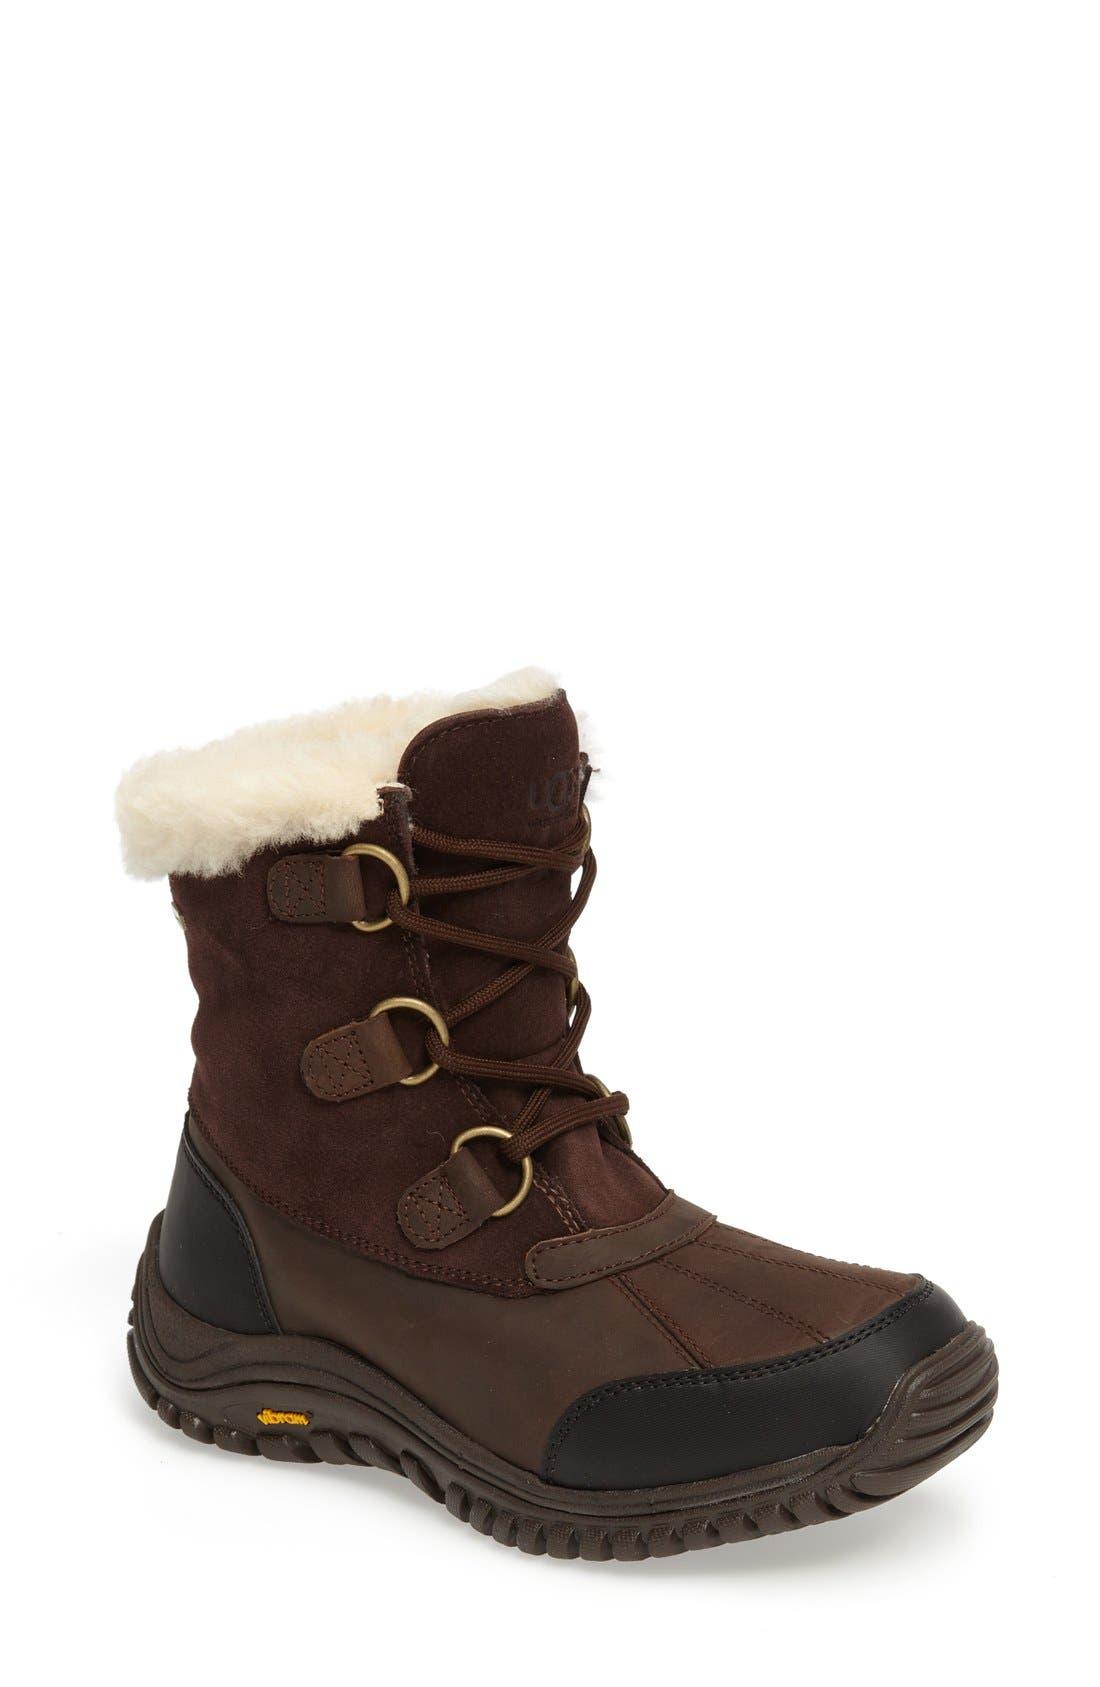 Main Image - UGG® Ostrander Waterproof Winter Boot (Women)